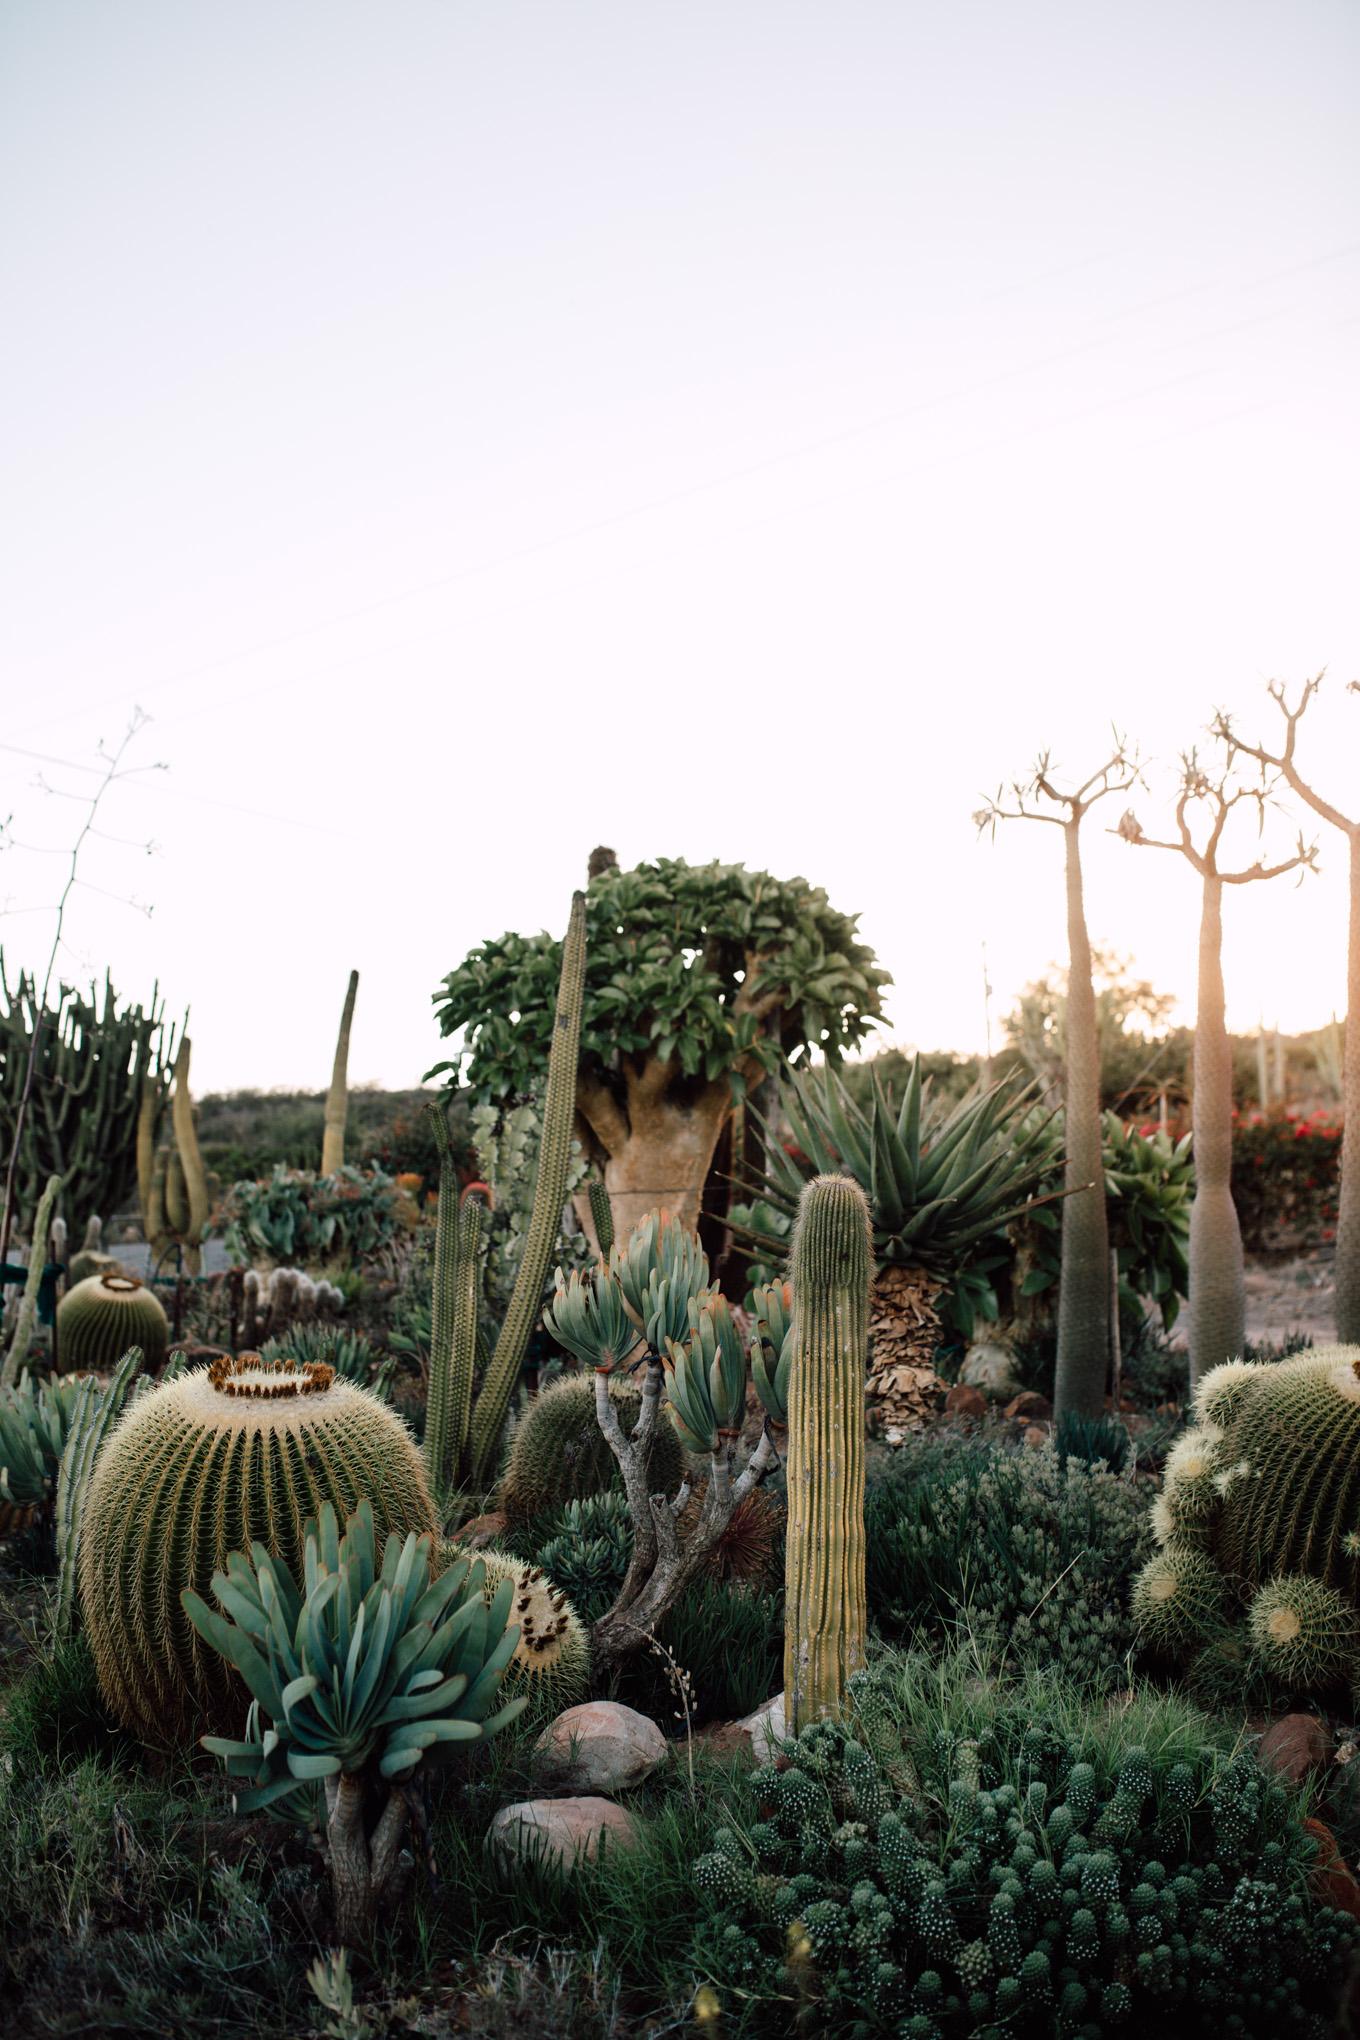 Cape-Town-Pia-Anna-Christian-Wedding-Photography-South-Africa-Bride-Cactus-1.jpg